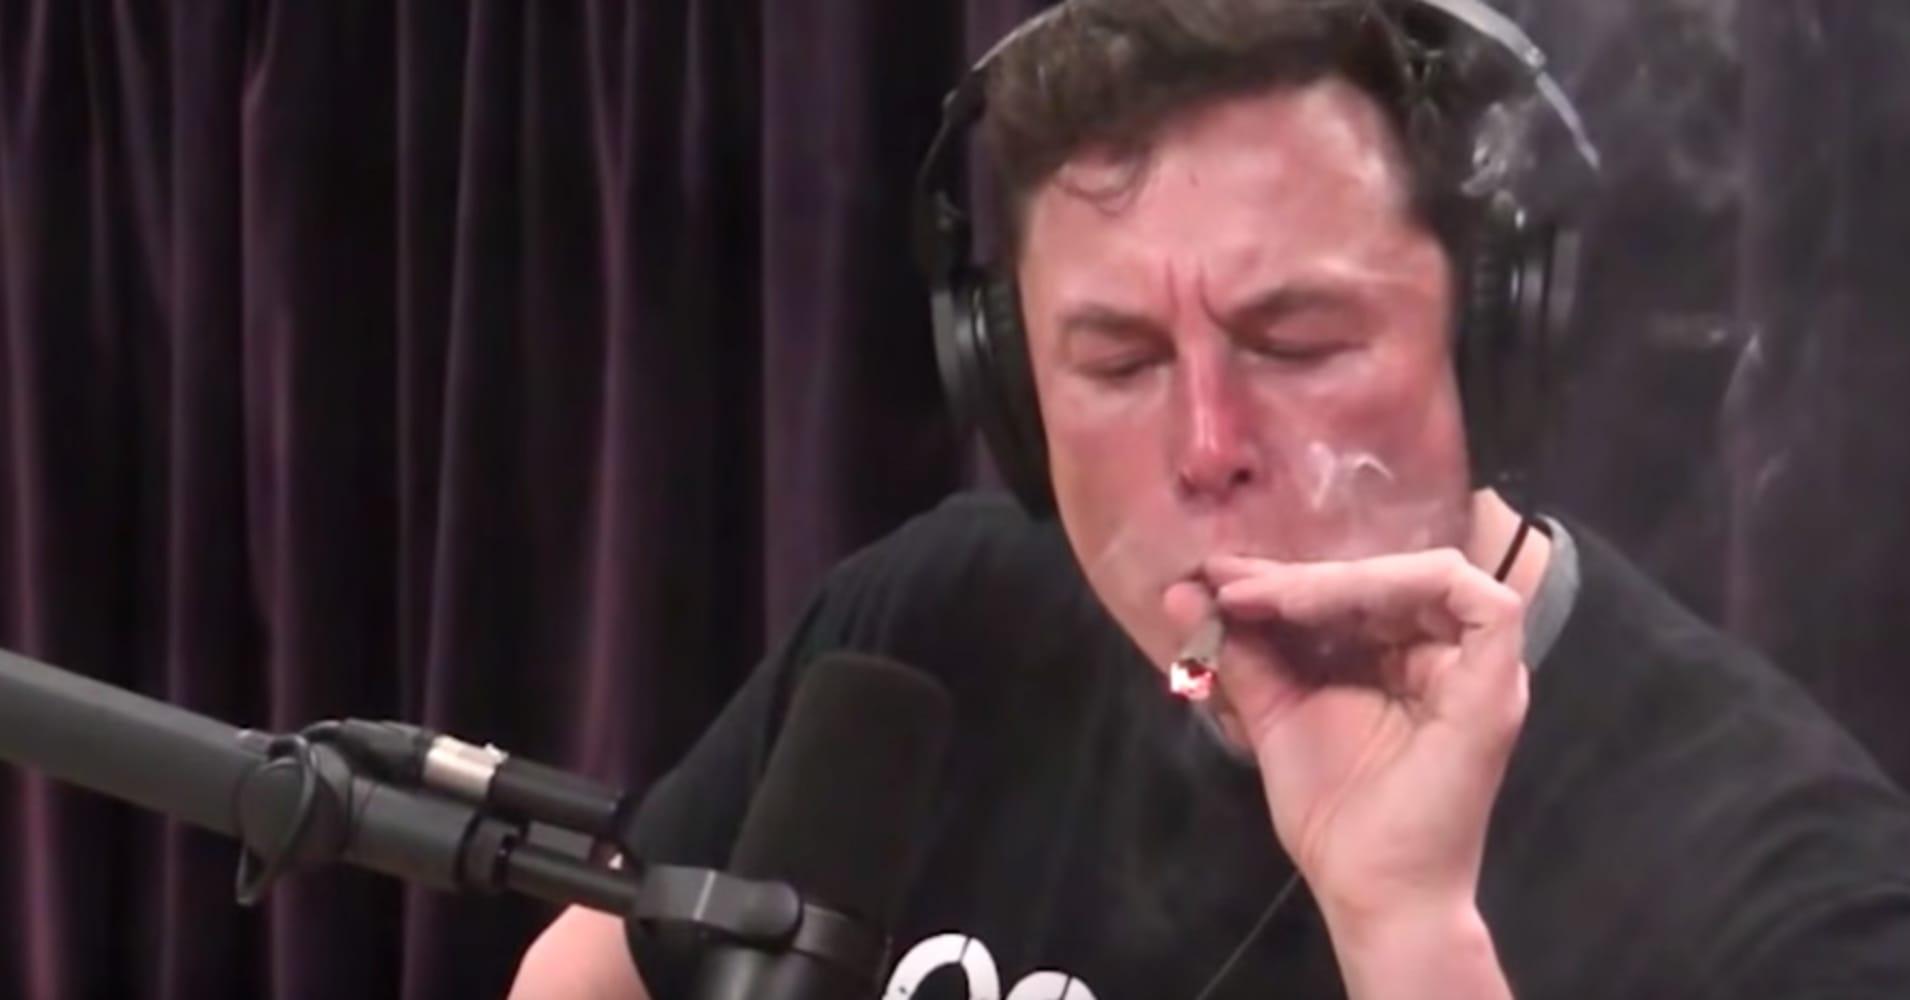 Elon Musk smokes marijuana with Joe Rogan's during a taping of Rogan's podcast show.